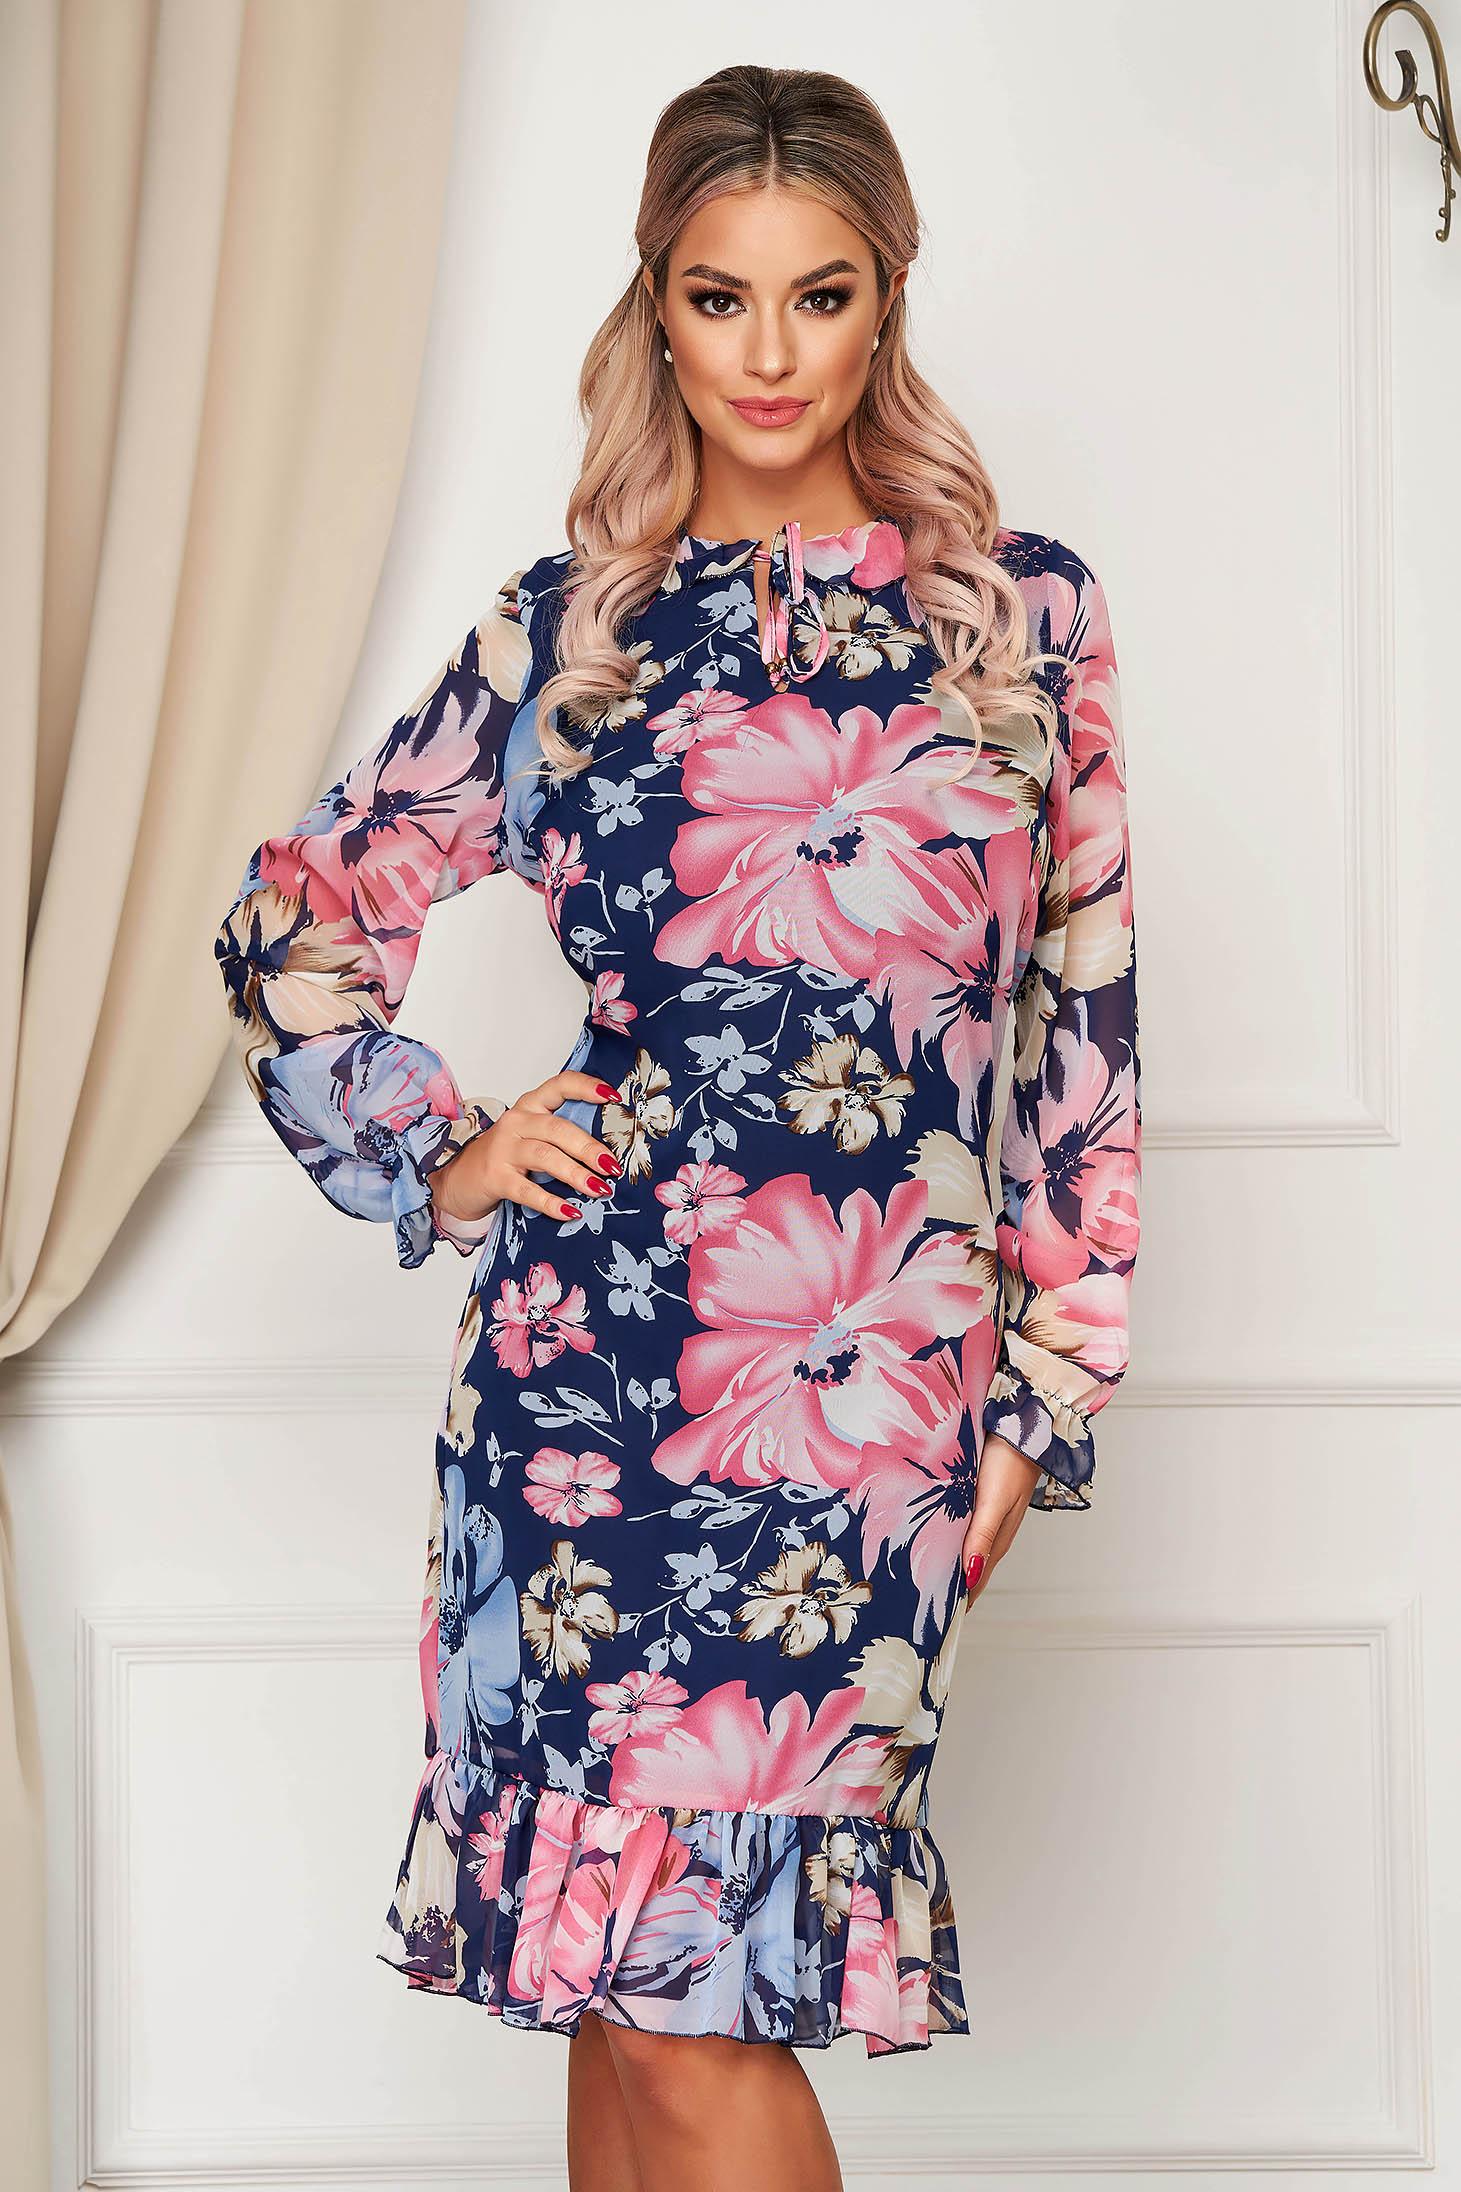 Rochie StarShinerS roz eleganta cu un croi drept cu volanase la baza rochiei